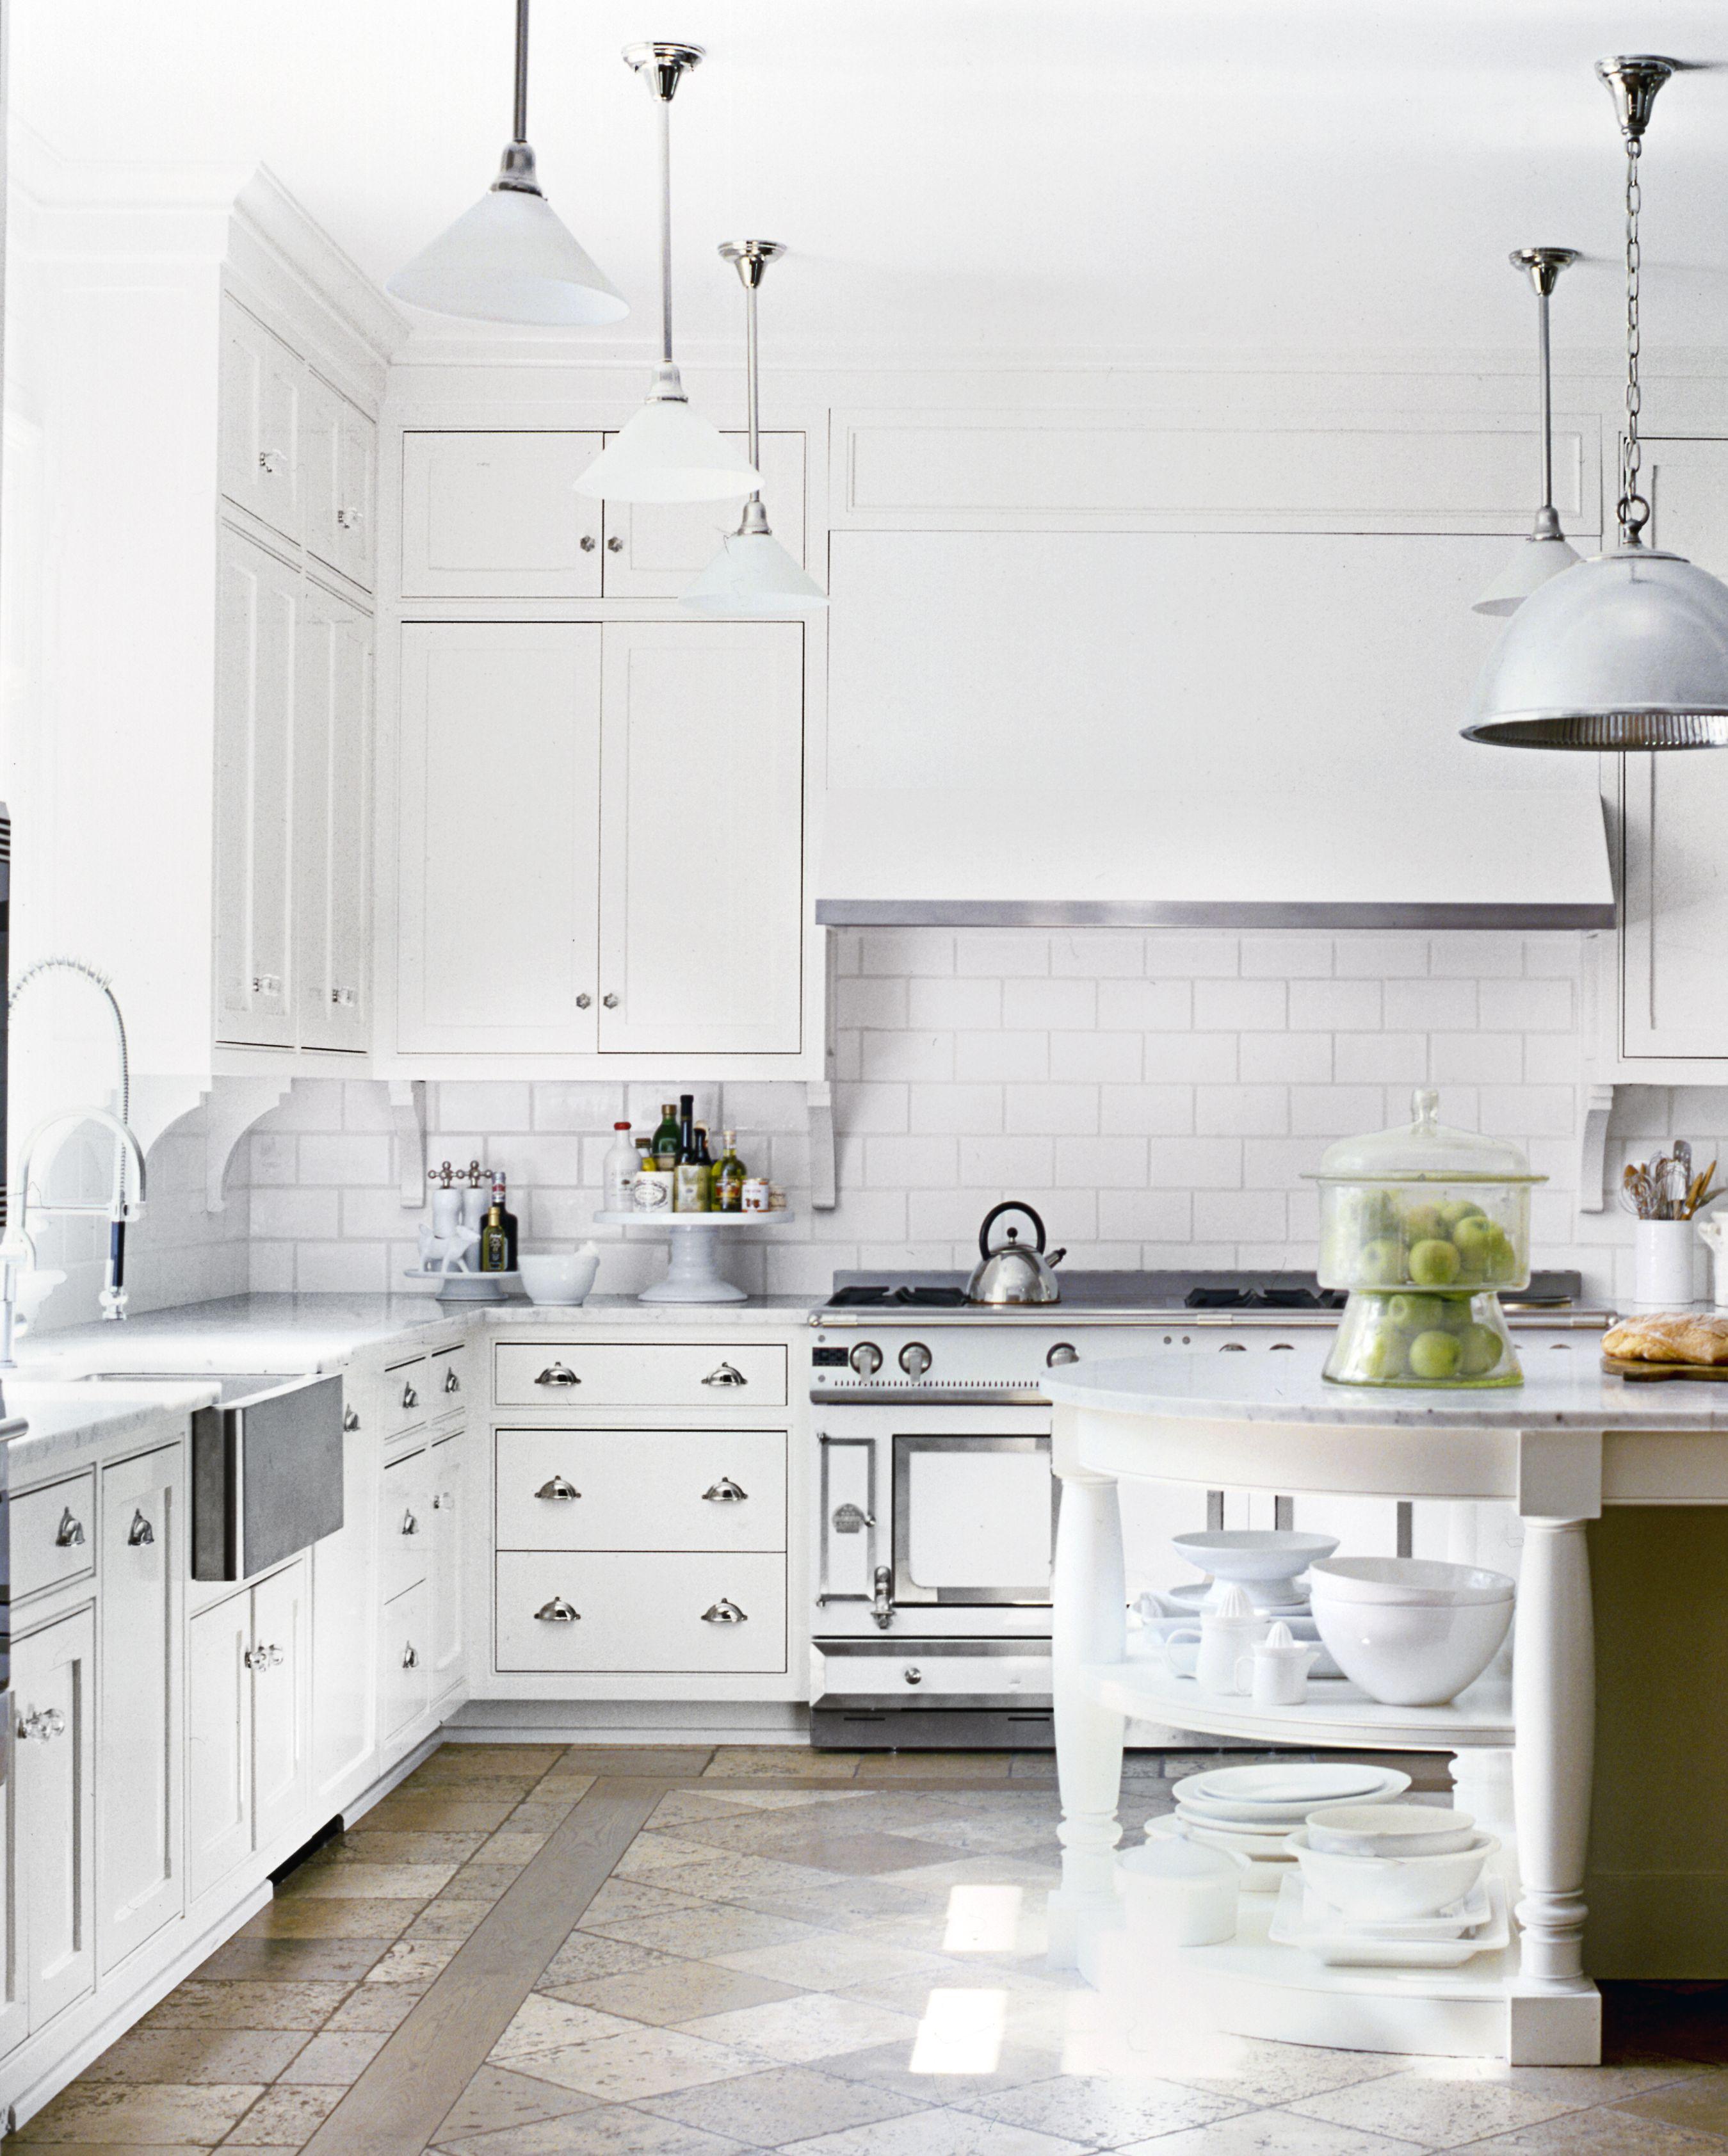 Kitchen White Cabinets Decorating Ideas: 15 White Kitchen Design Ideas